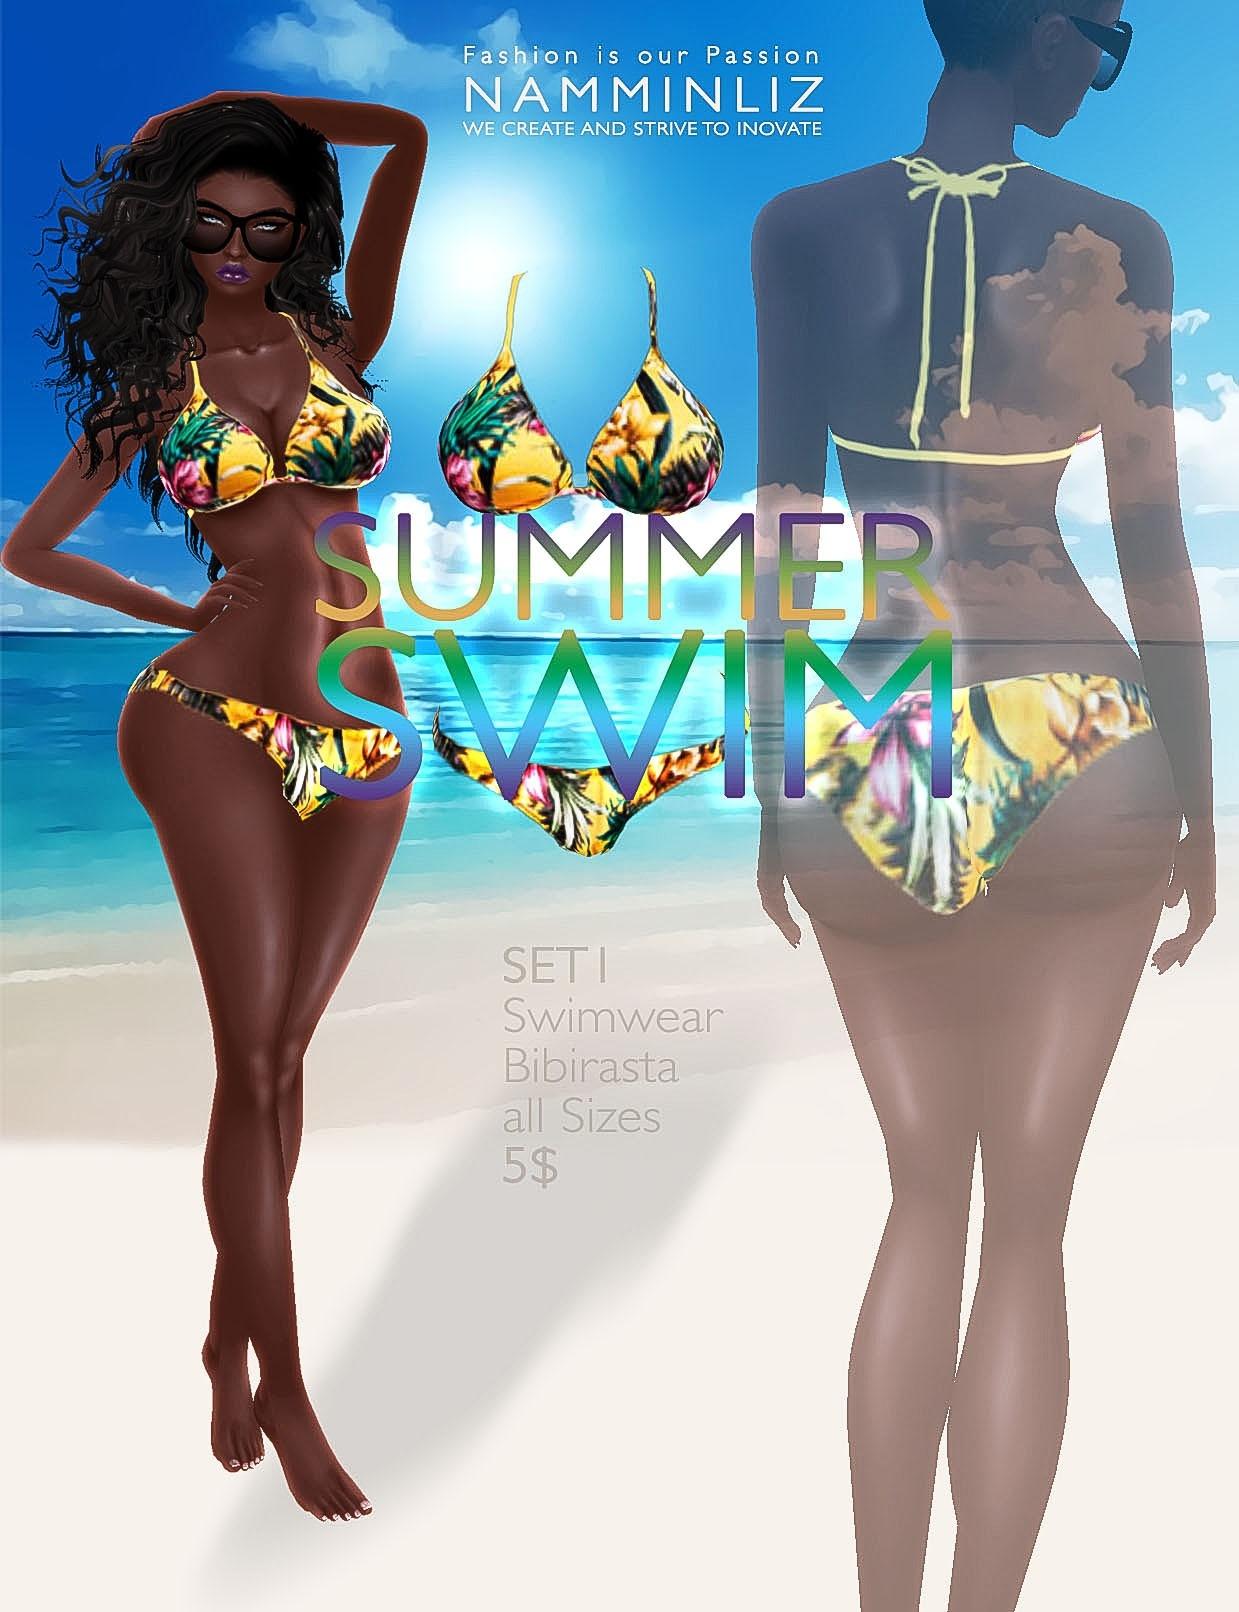 Summer swim SET1 imvu Bibirasta all sizes swimwear texture file sale